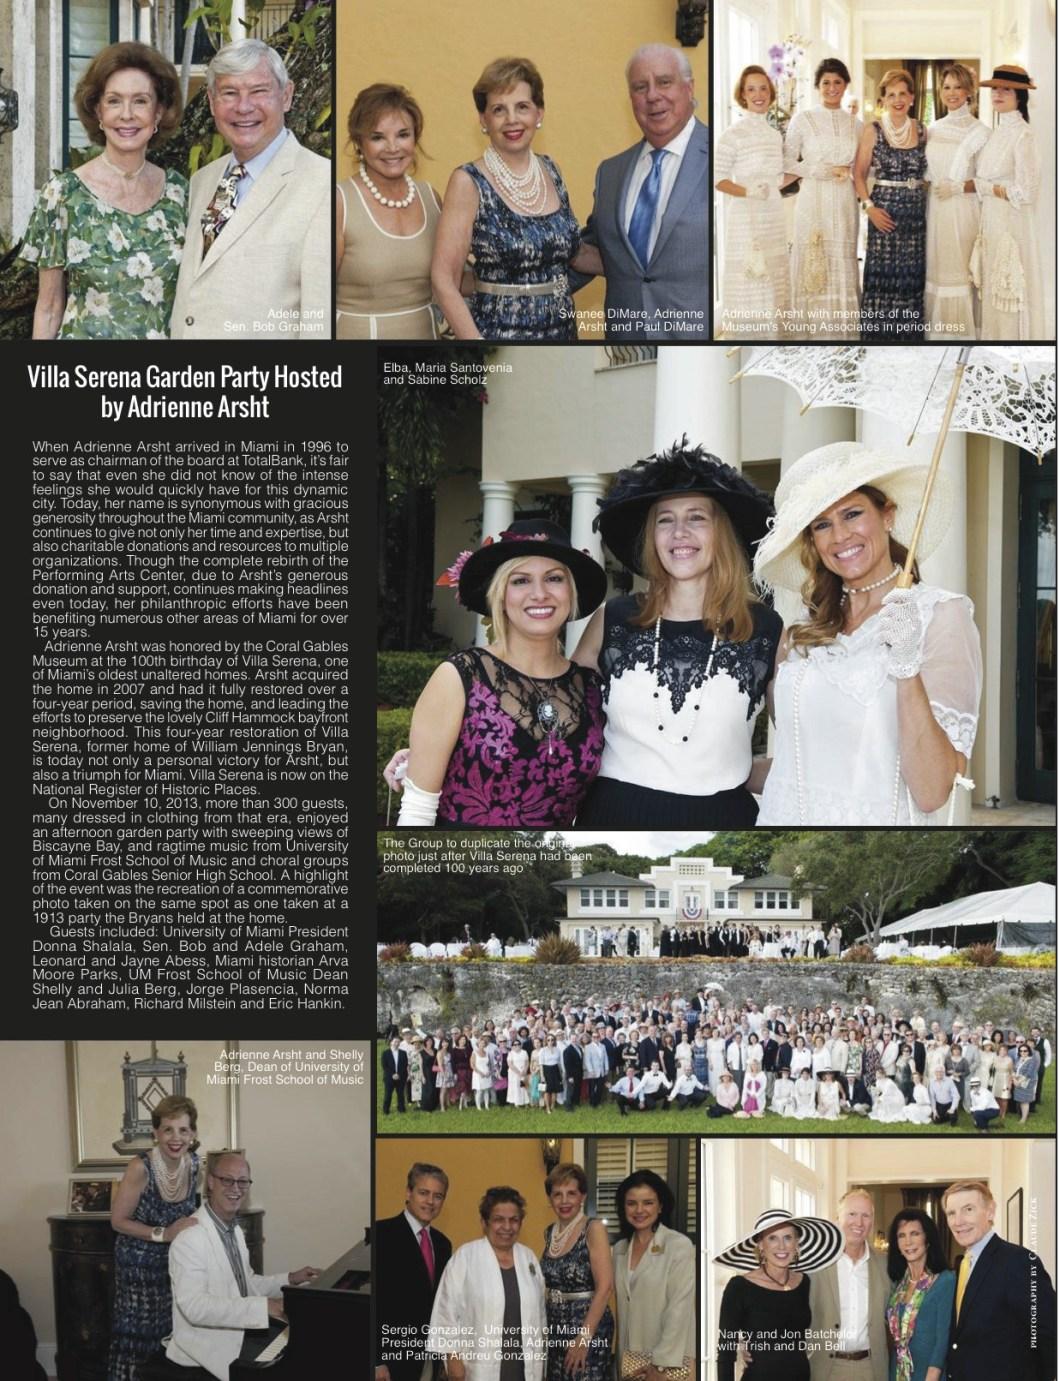 Global Living Magazine | Adrienne Arsht | By Damon M. Banks